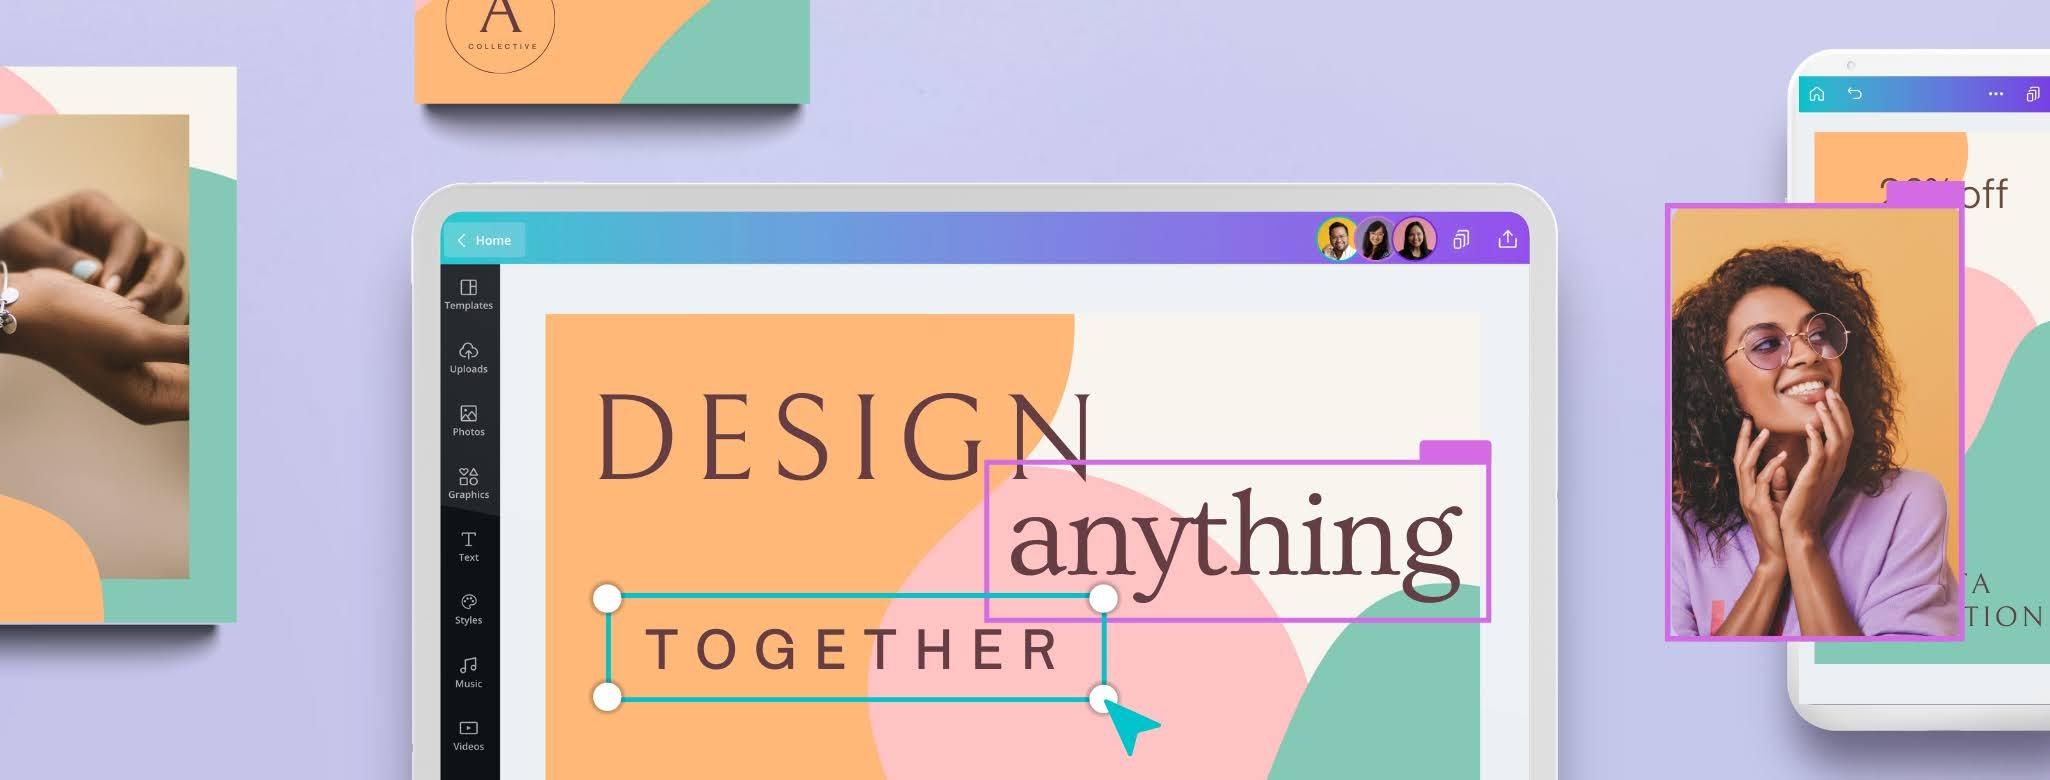 Lowongan Kerja Remote Senior Graphic Designer (Canva)